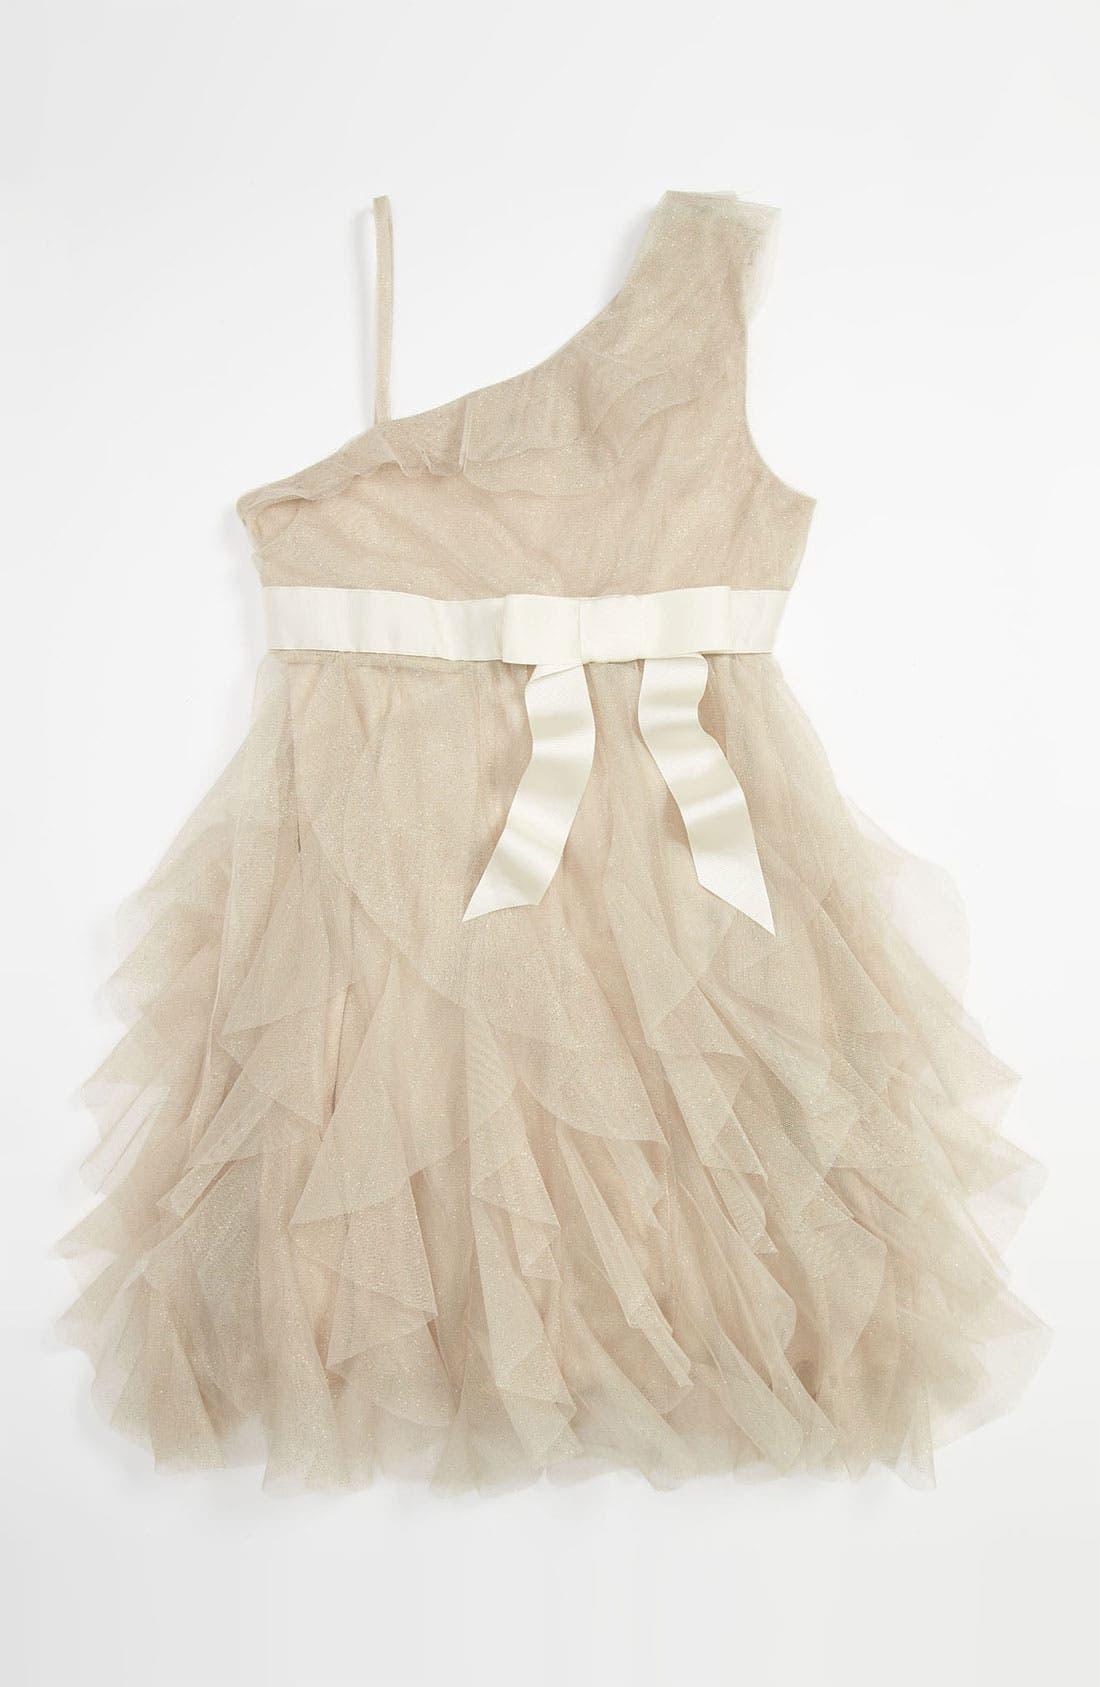 Main Image - Jessica McClintock 'Sophie' Dress (Big Girls)